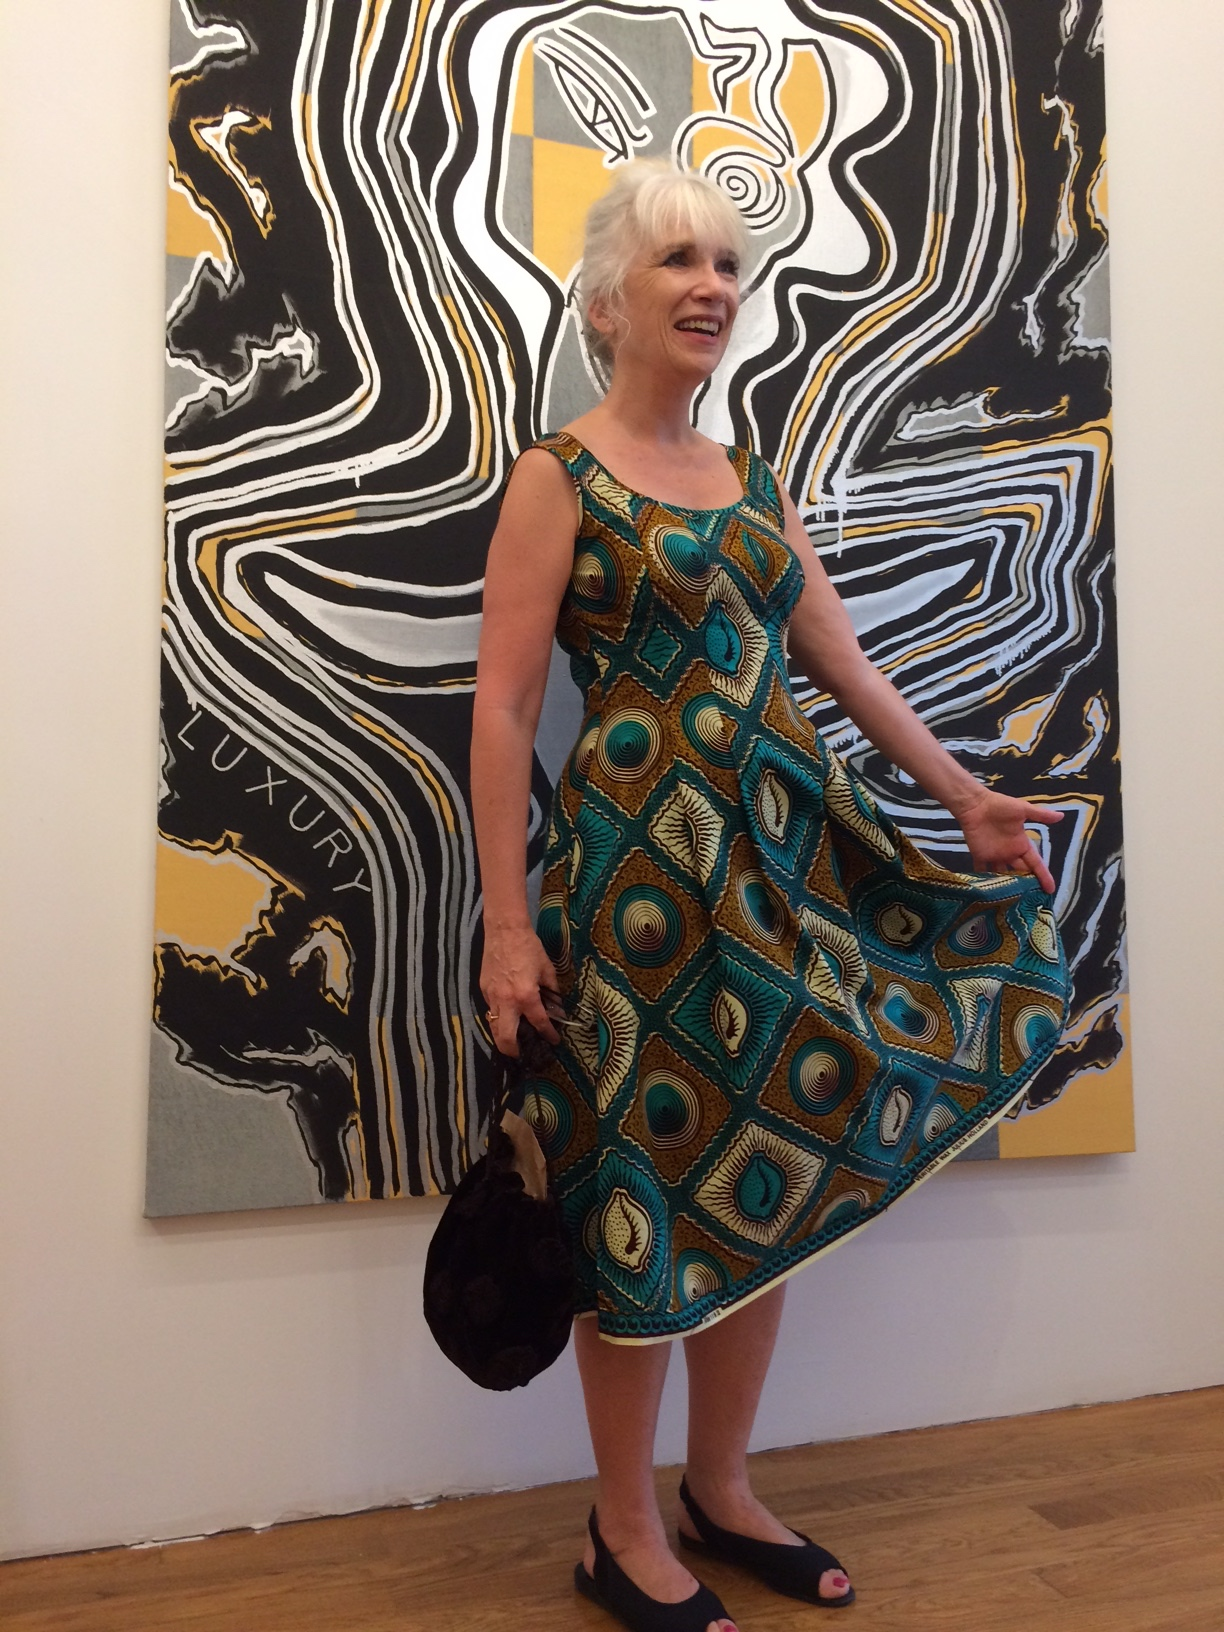 Devin Dougherty in Elizabeth Cannon Wax-print dress in front of Josh Abelow painting  photo: Taro Suzuki